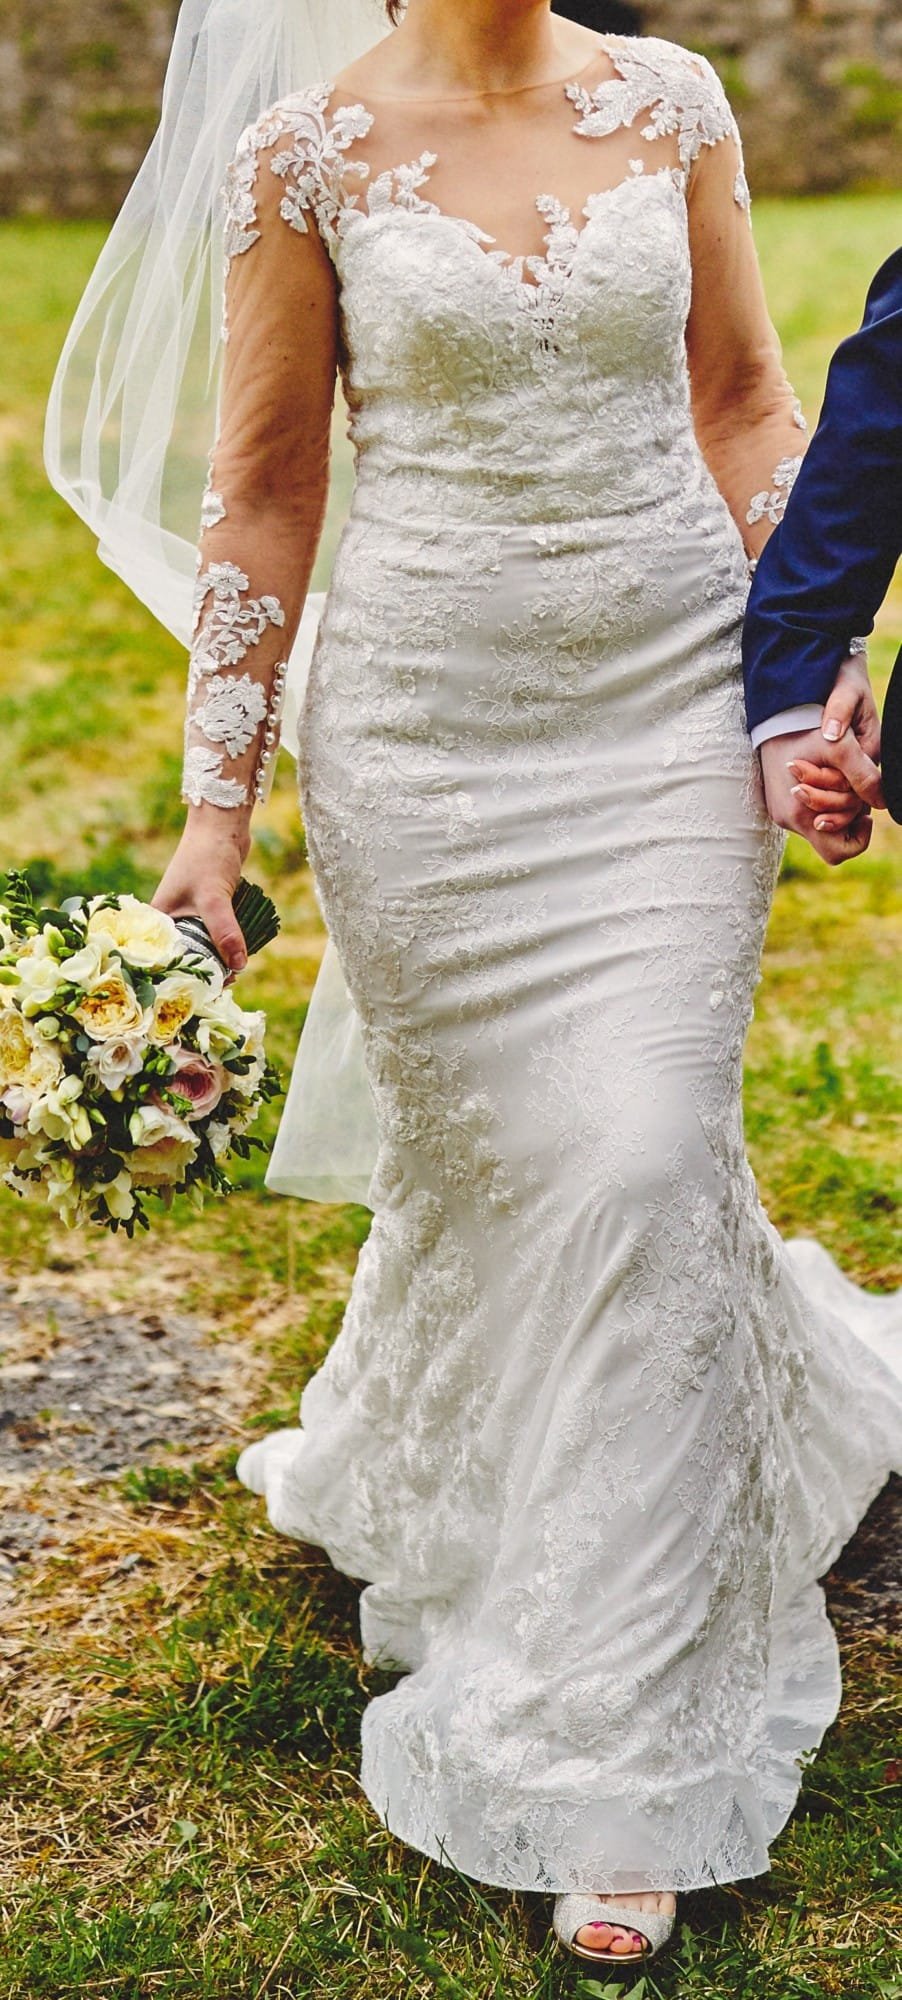 Dando London Tulum Fulham Broadway Lace Wedding Dress